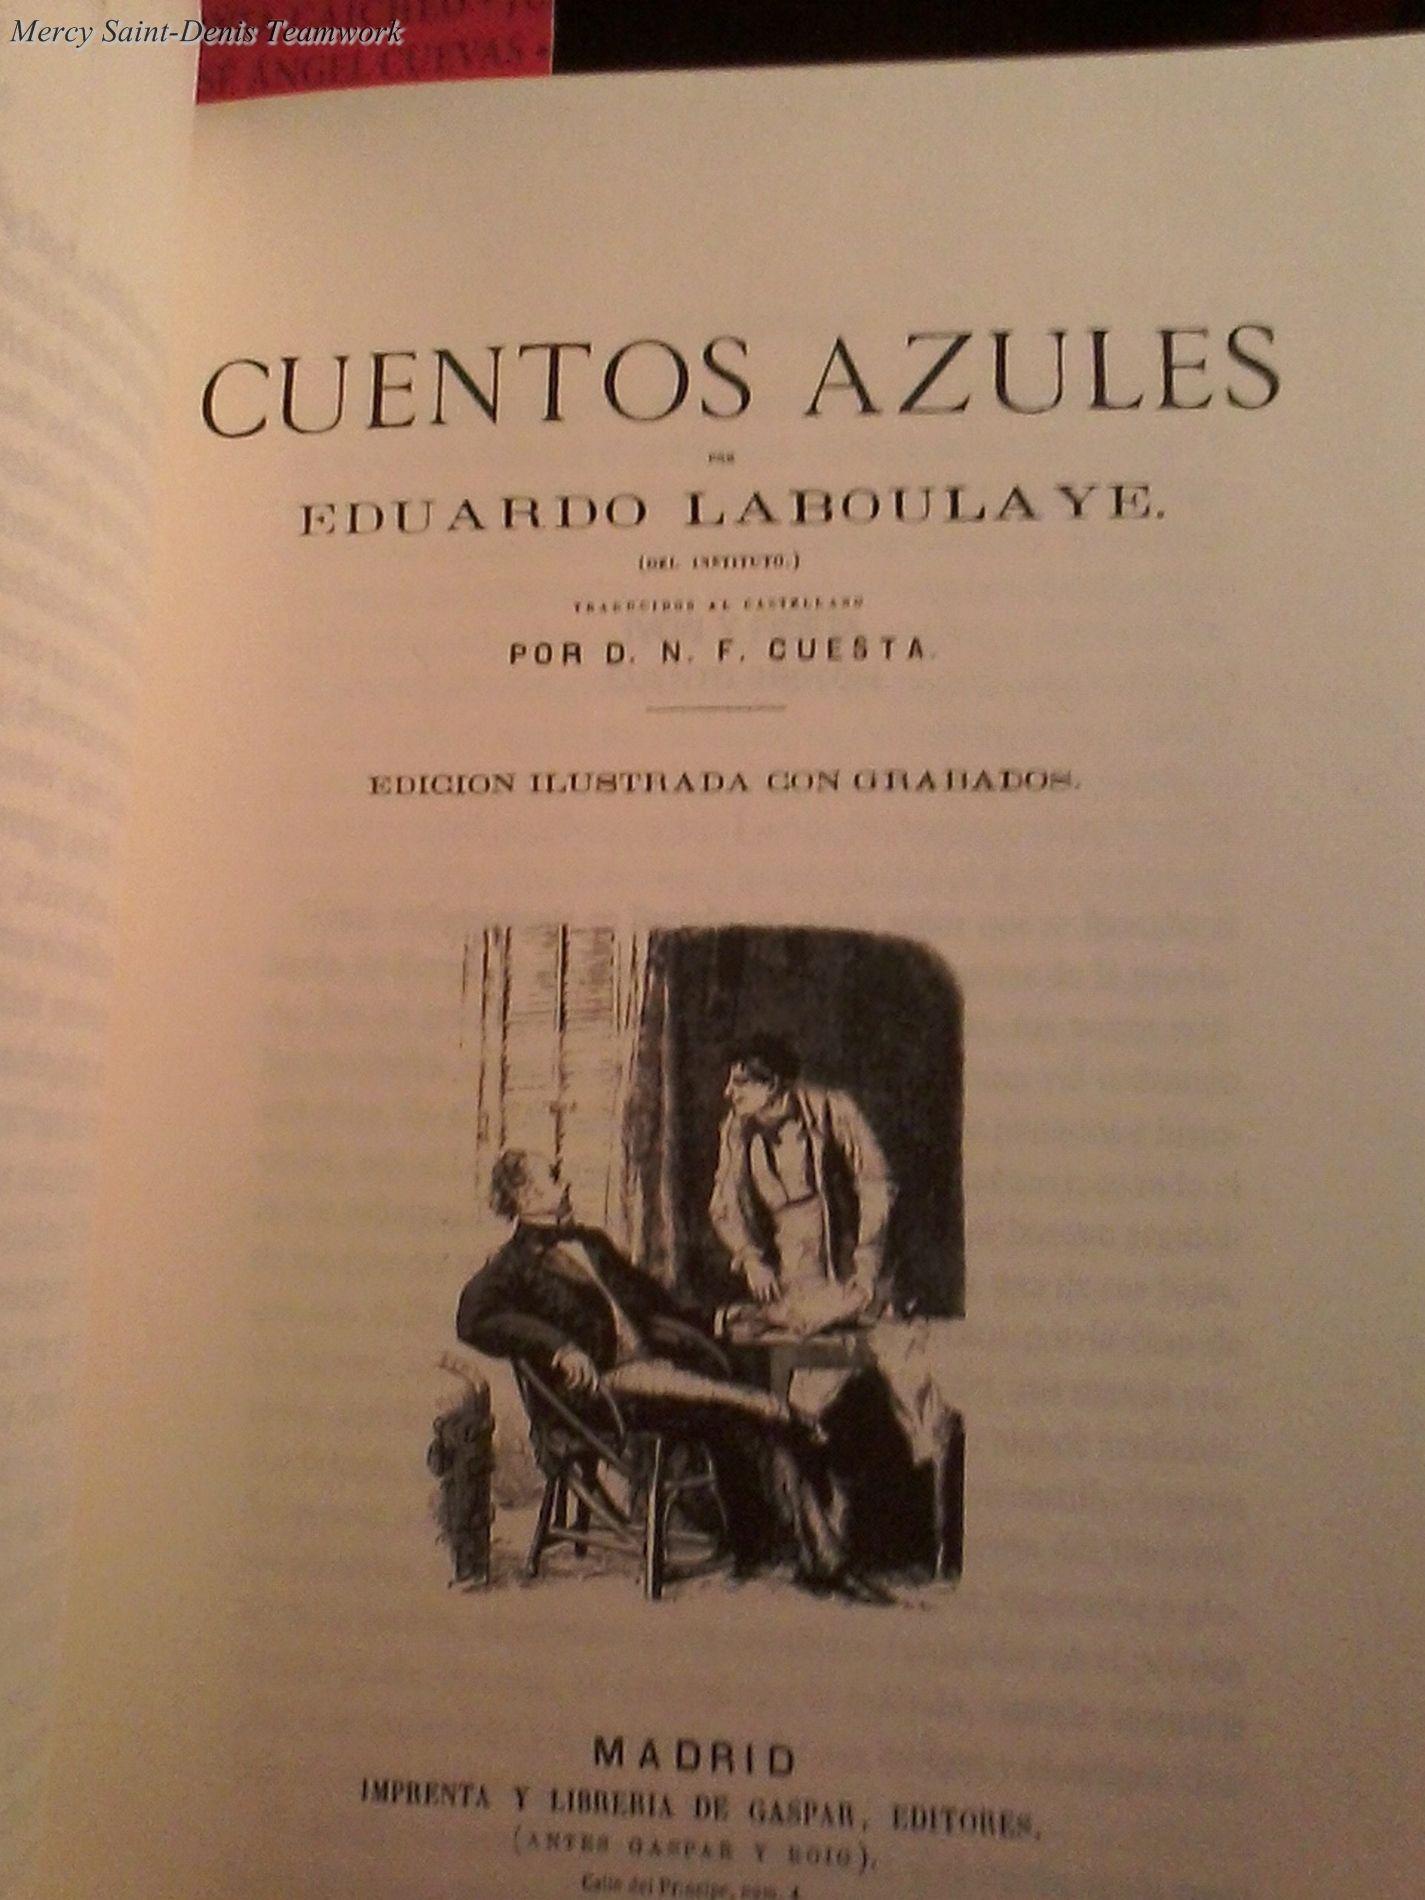 Cuentos Azules - Eduardo Laboulaye.